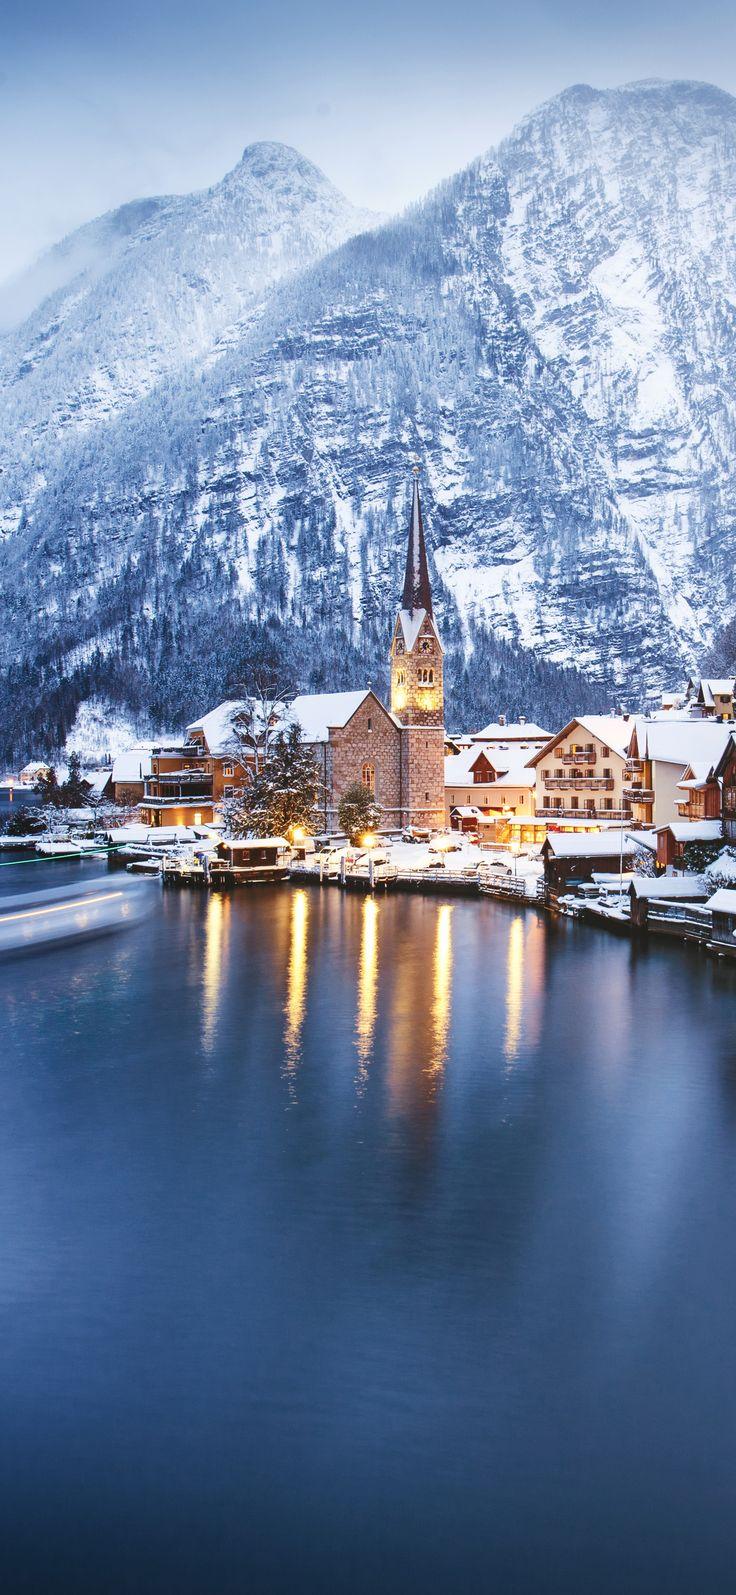 25 Best Ideas About Hallstatt Winter On Pinterest Wanderlust Innsbruck And Parks